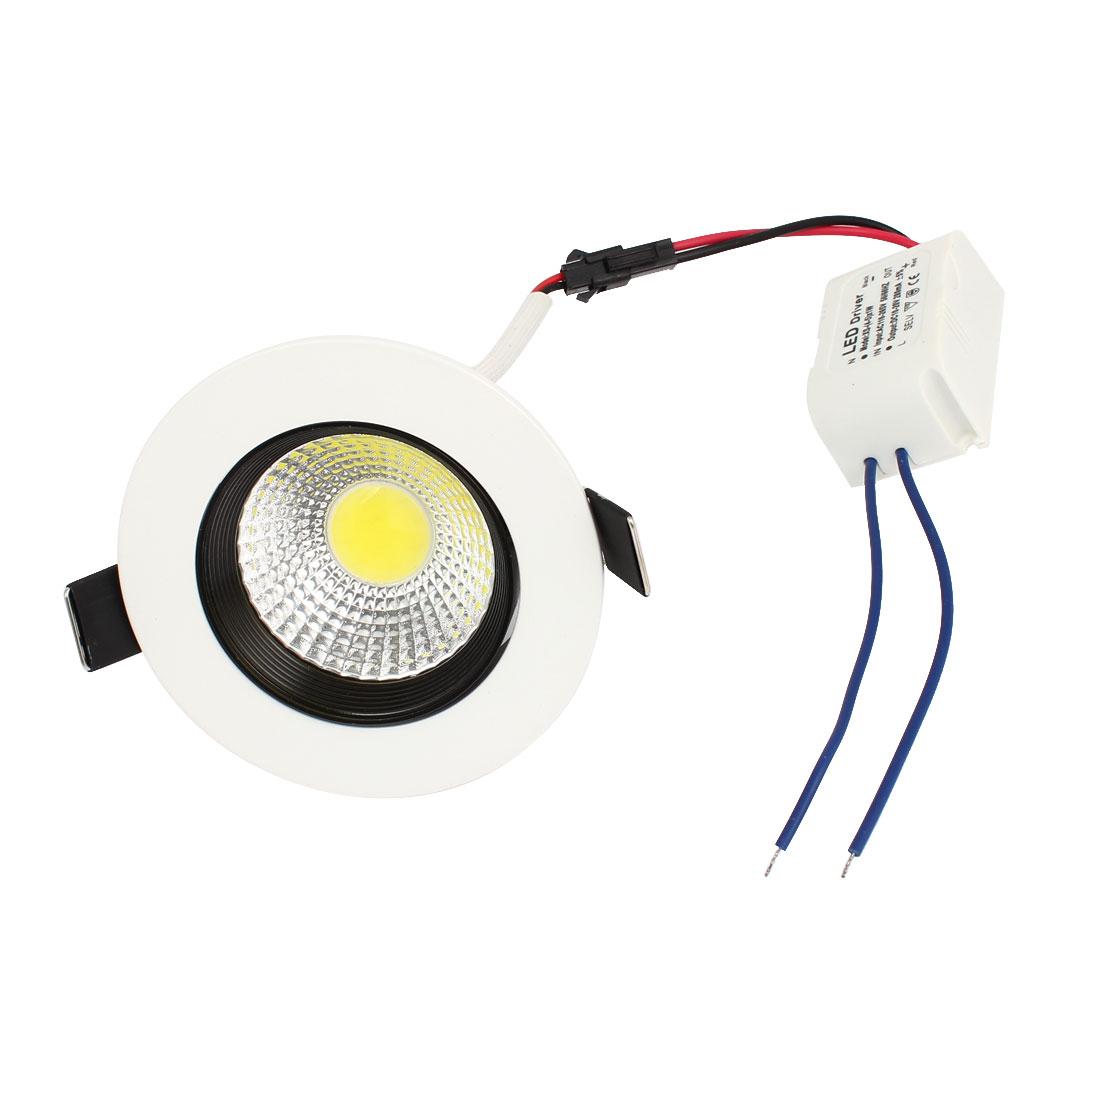 AC110V-265V 5W COB Pure White Ceiling Downlight Recessed Spot Bulb + LED Driver